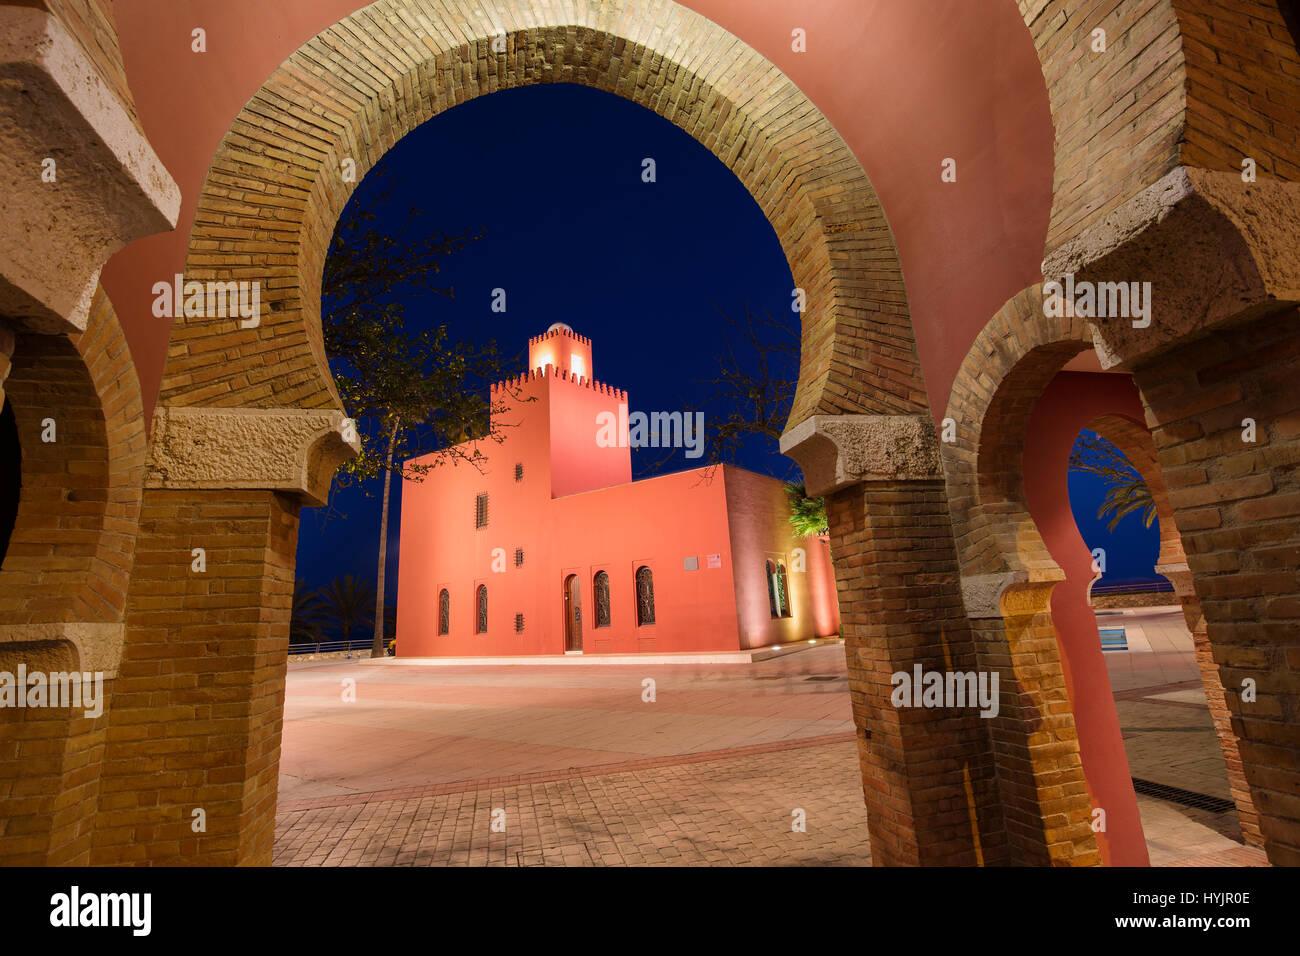 Bil-Bil castle built in neo-Arab style in 1934, Benalmadena. Malaga province Costa del Sol. Andalusia Southern Spain, - Stock Image